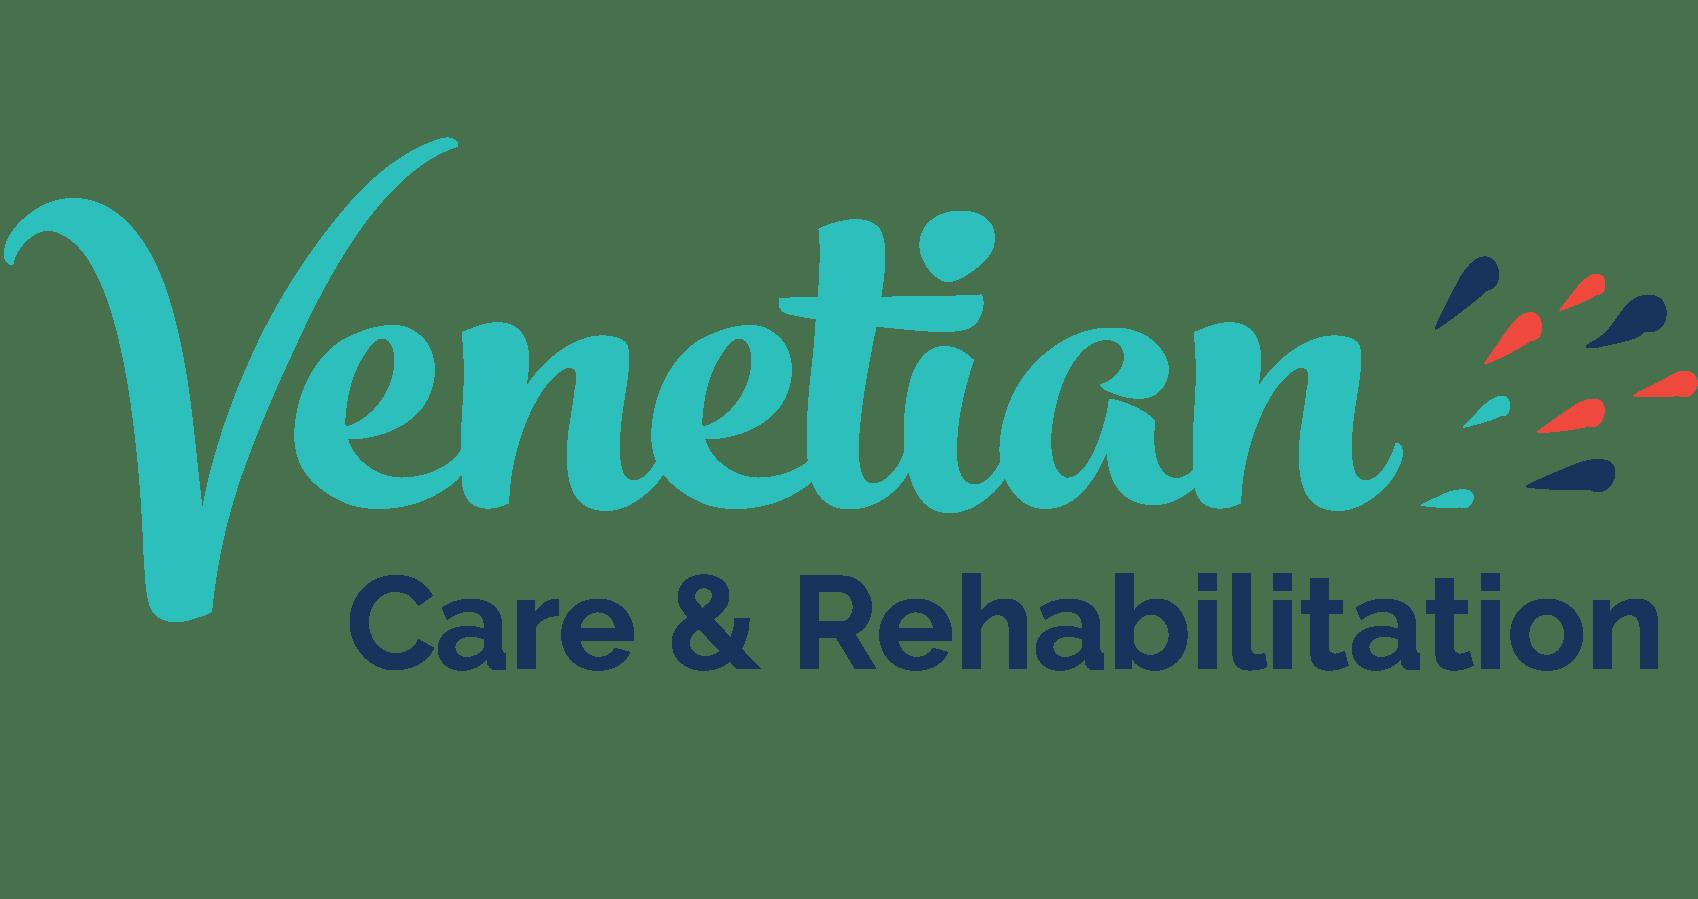 Logo: Venetian Care and Rehabilitation CCNJ Sponsor